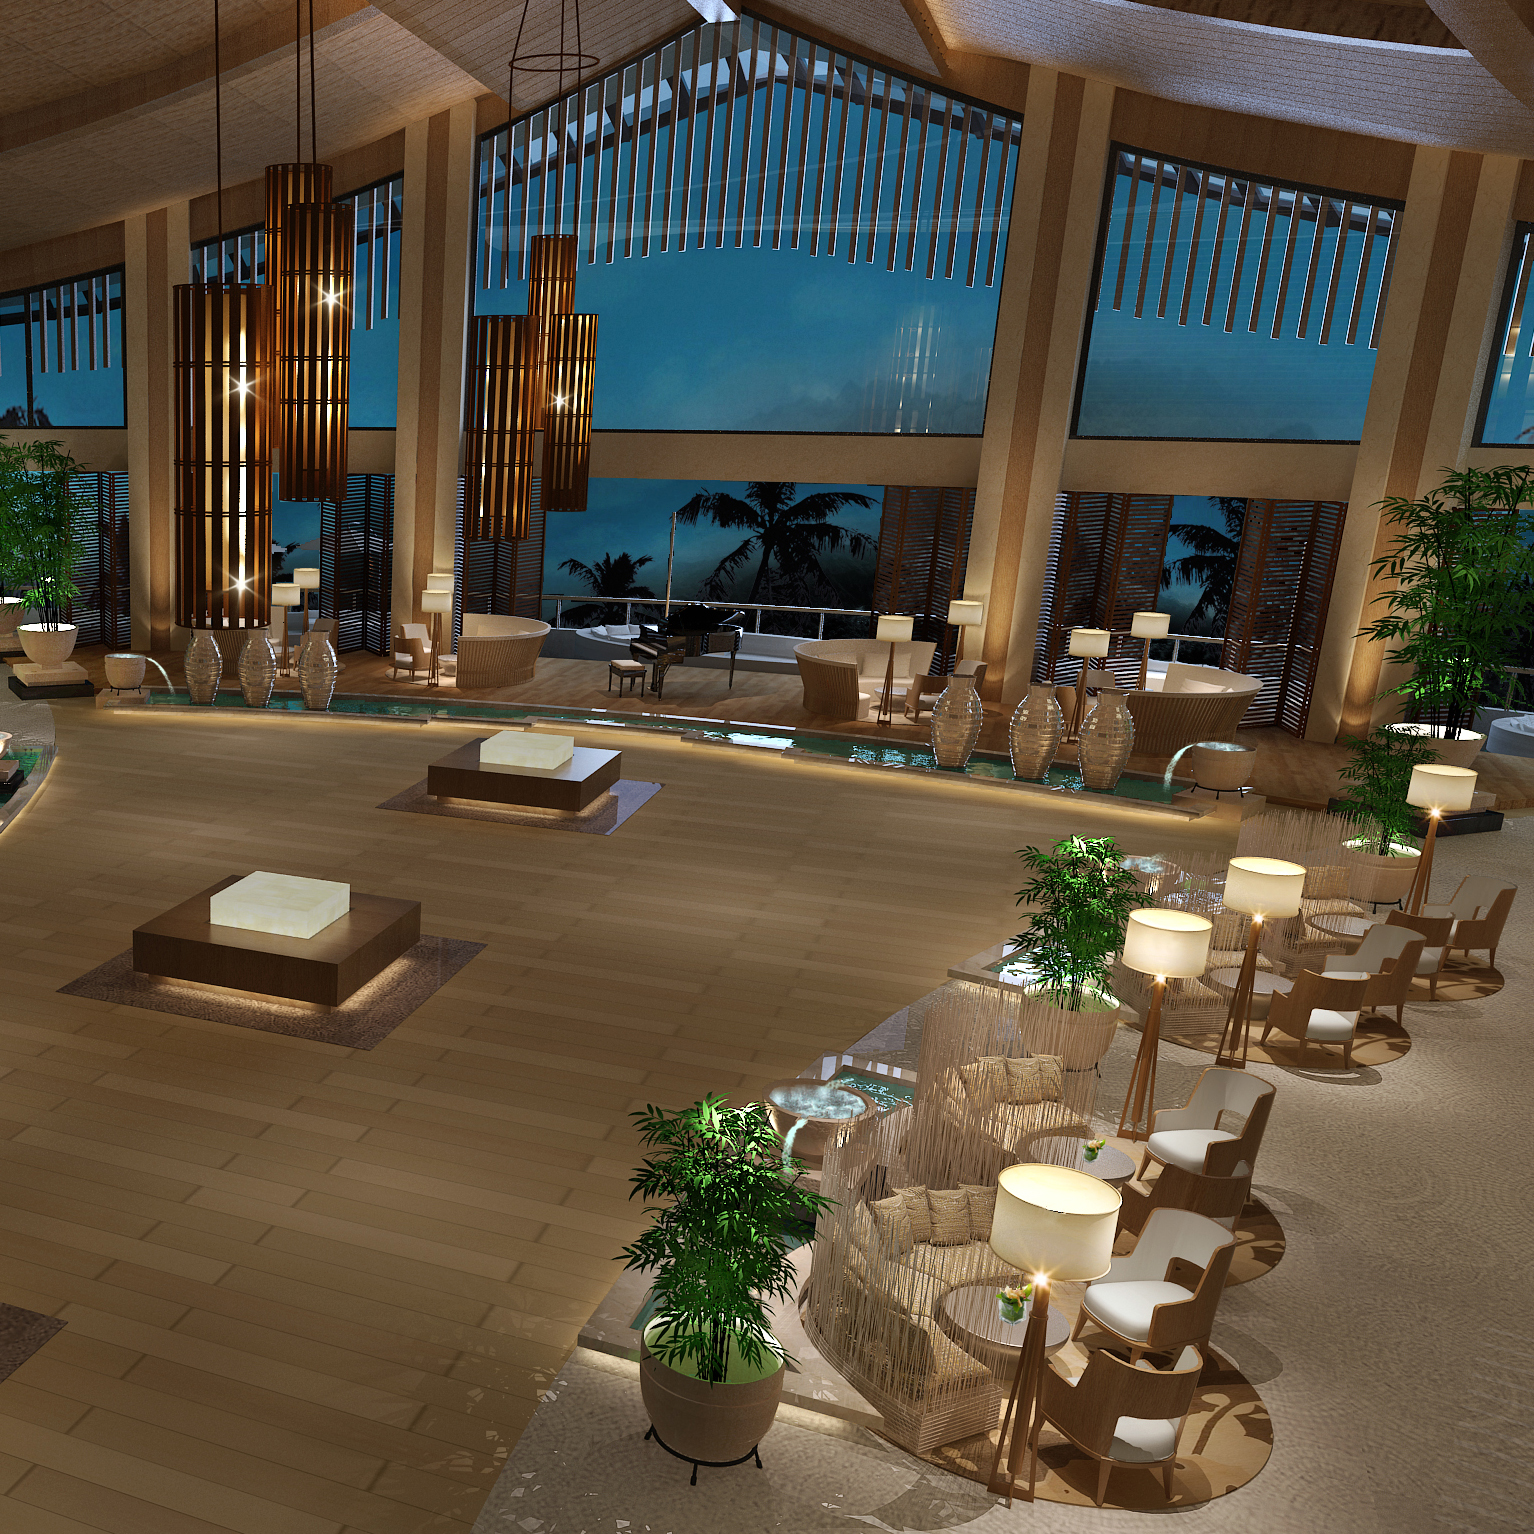 Radission Blu Sanya - Lobby Overview